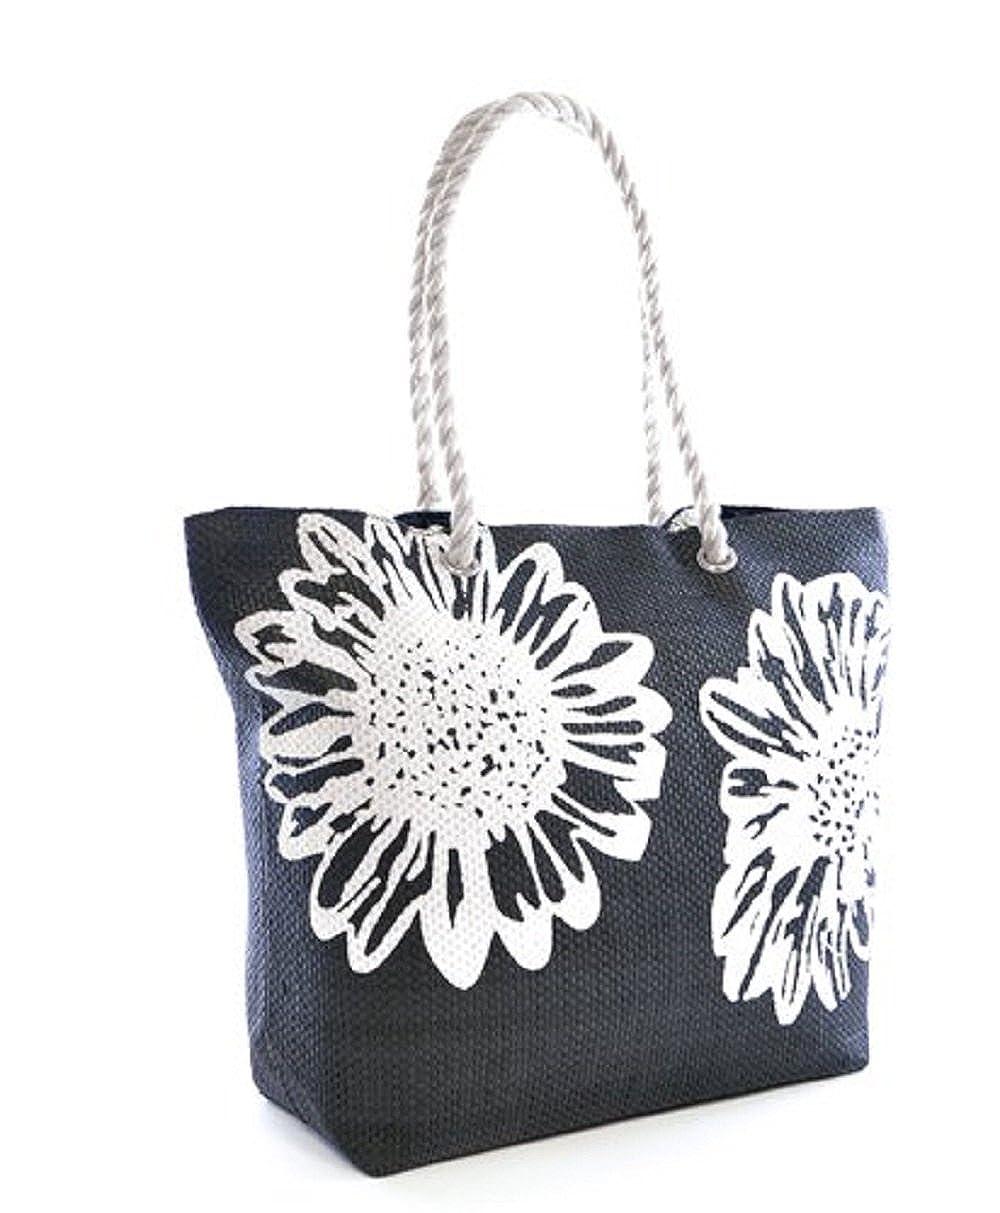 660c667661ff Amazon.com  Beach Bag Tote Bags for Women Ladies Large Summer Shoulder Bag  With Pocket Carrier Bag Flower (Black)  Clothing